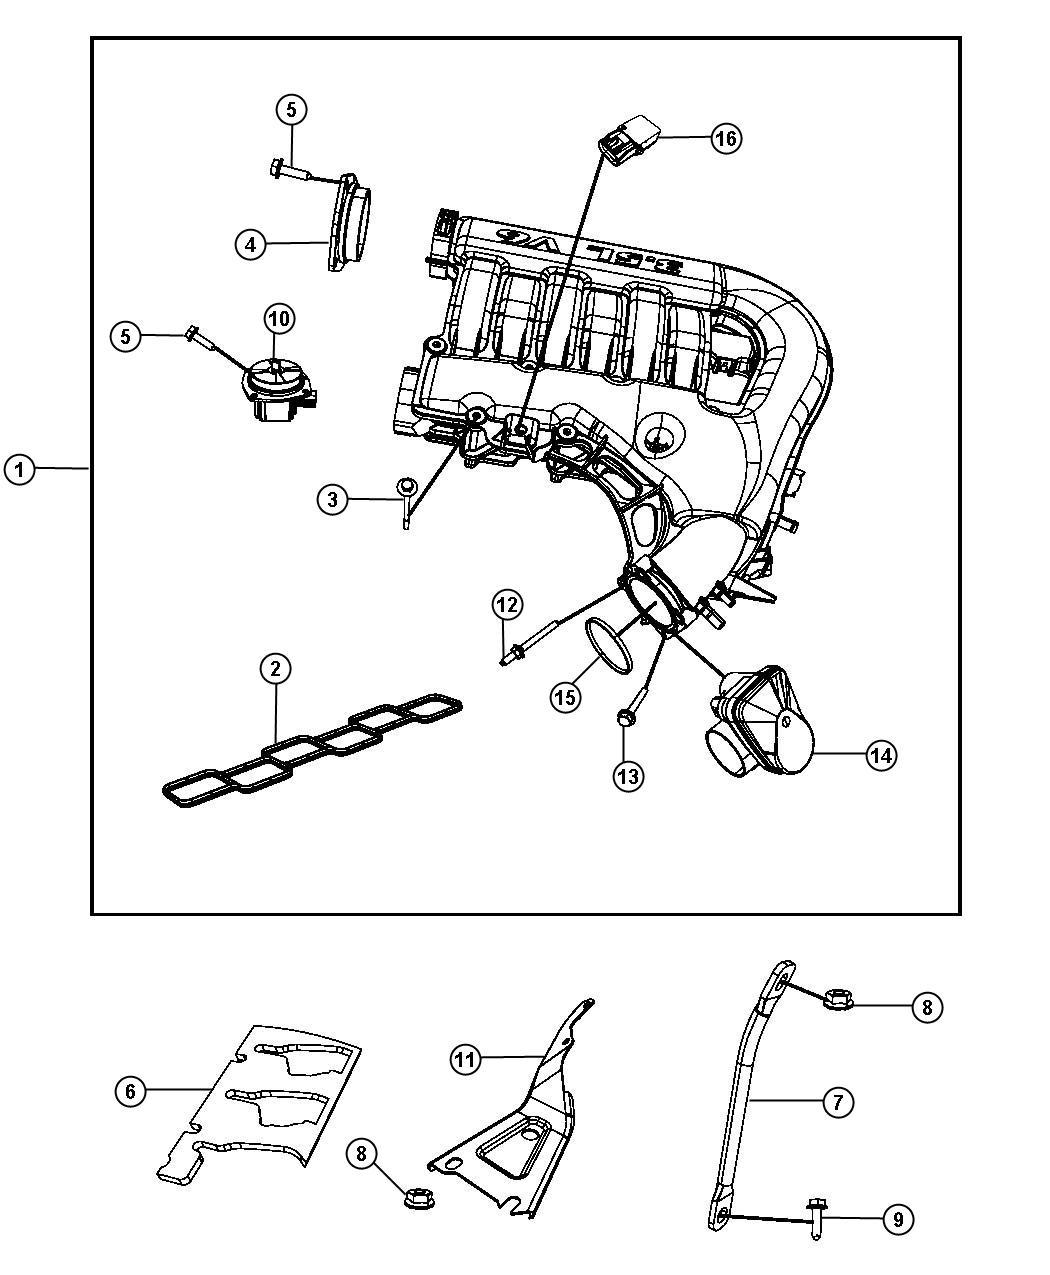 2008 Dodge Charger Pad. Engine. Egg, intake, manifold